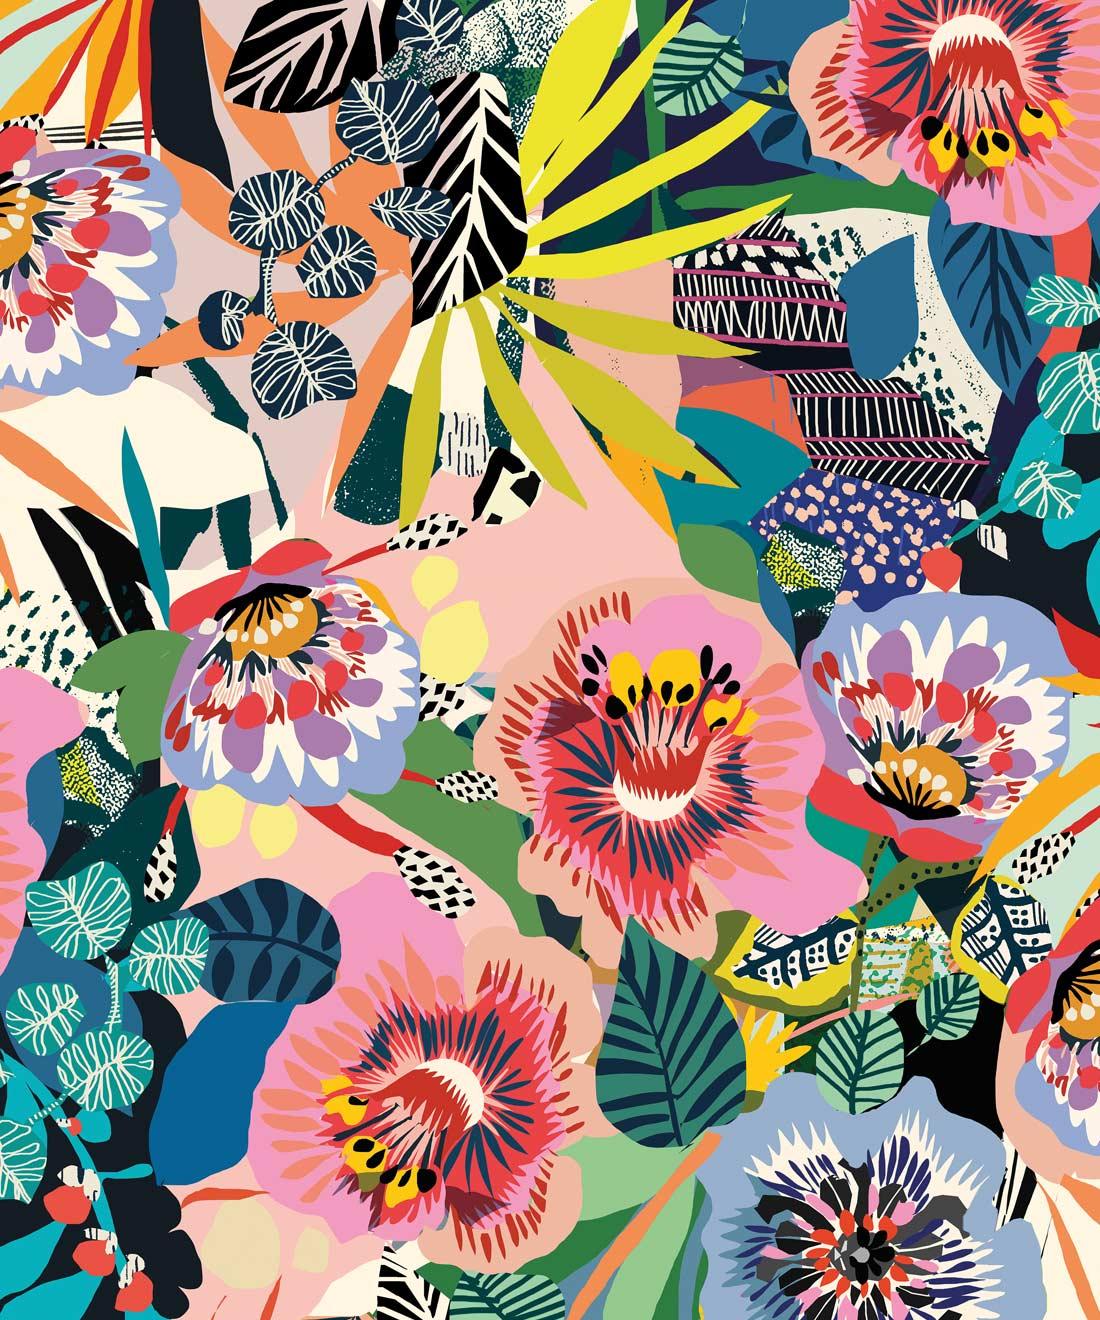 Summer Garden Bold Whimsical Floral Wallpaper Milton King